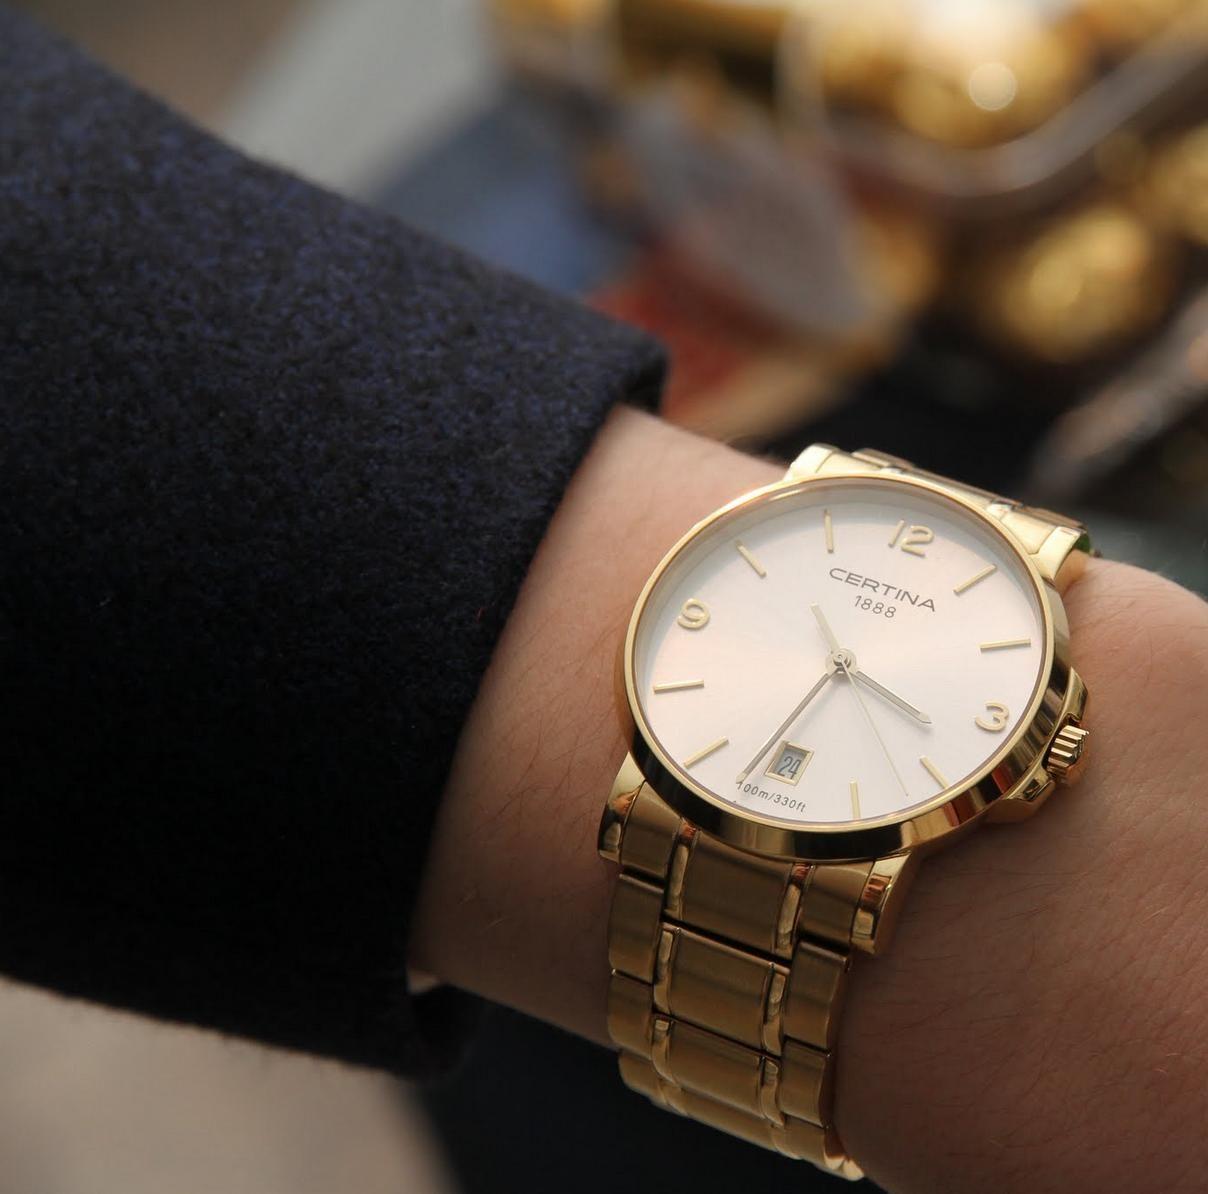 Certina Ds Caimano Watches Pinterest And Priorities Bulova 90271 Jam Tangan Pria Silver